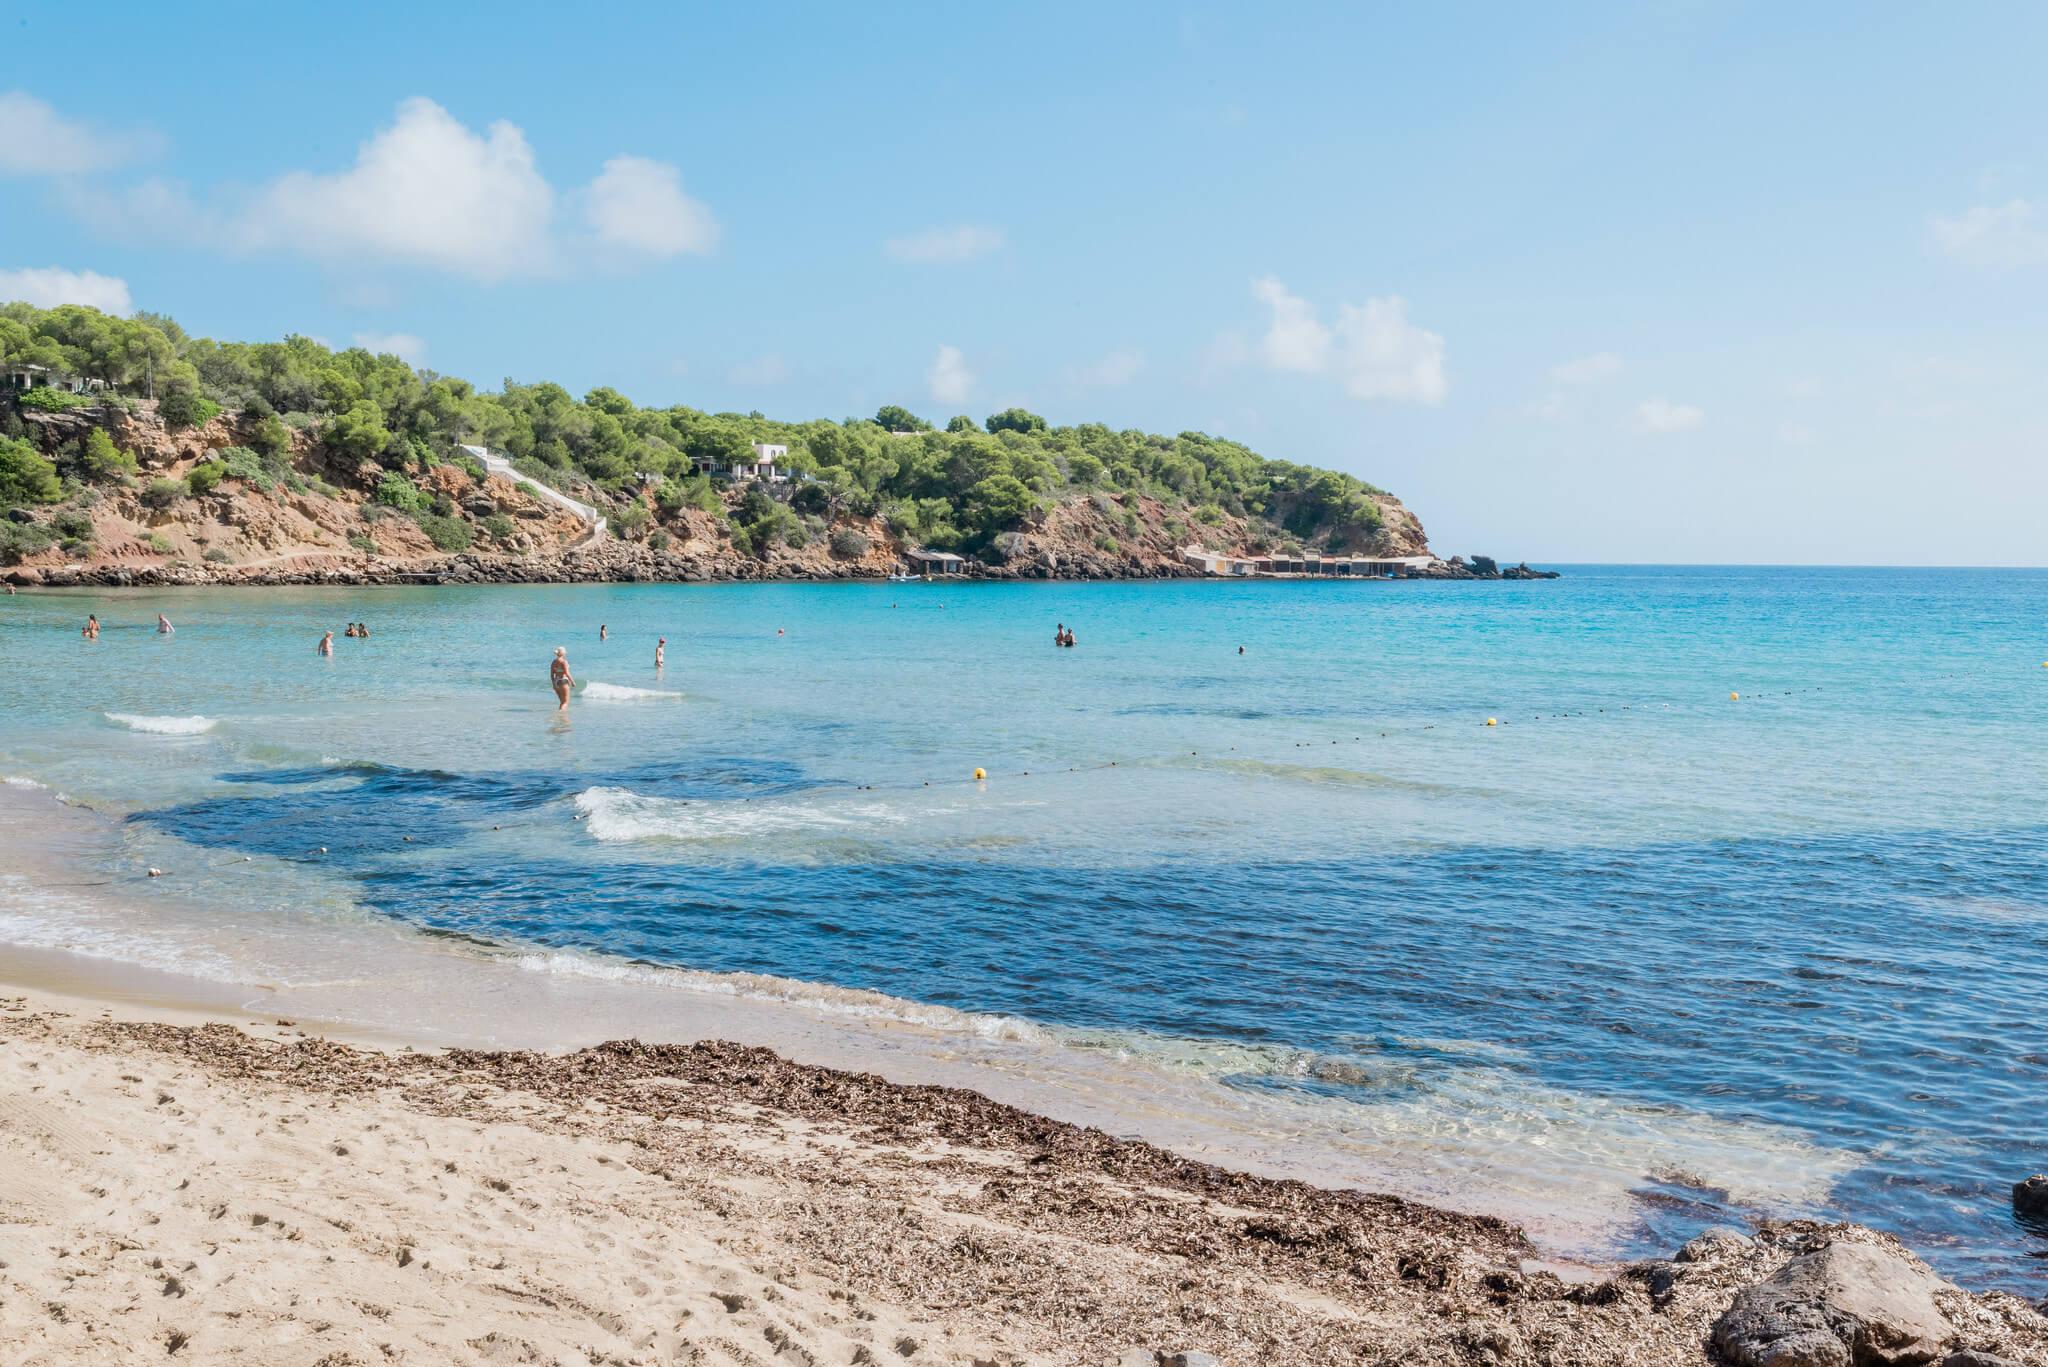 https://www.white-ibiza.com/wp-content/uploads/2020/03/ibiza-beaches-cala-llenya-02.jpg